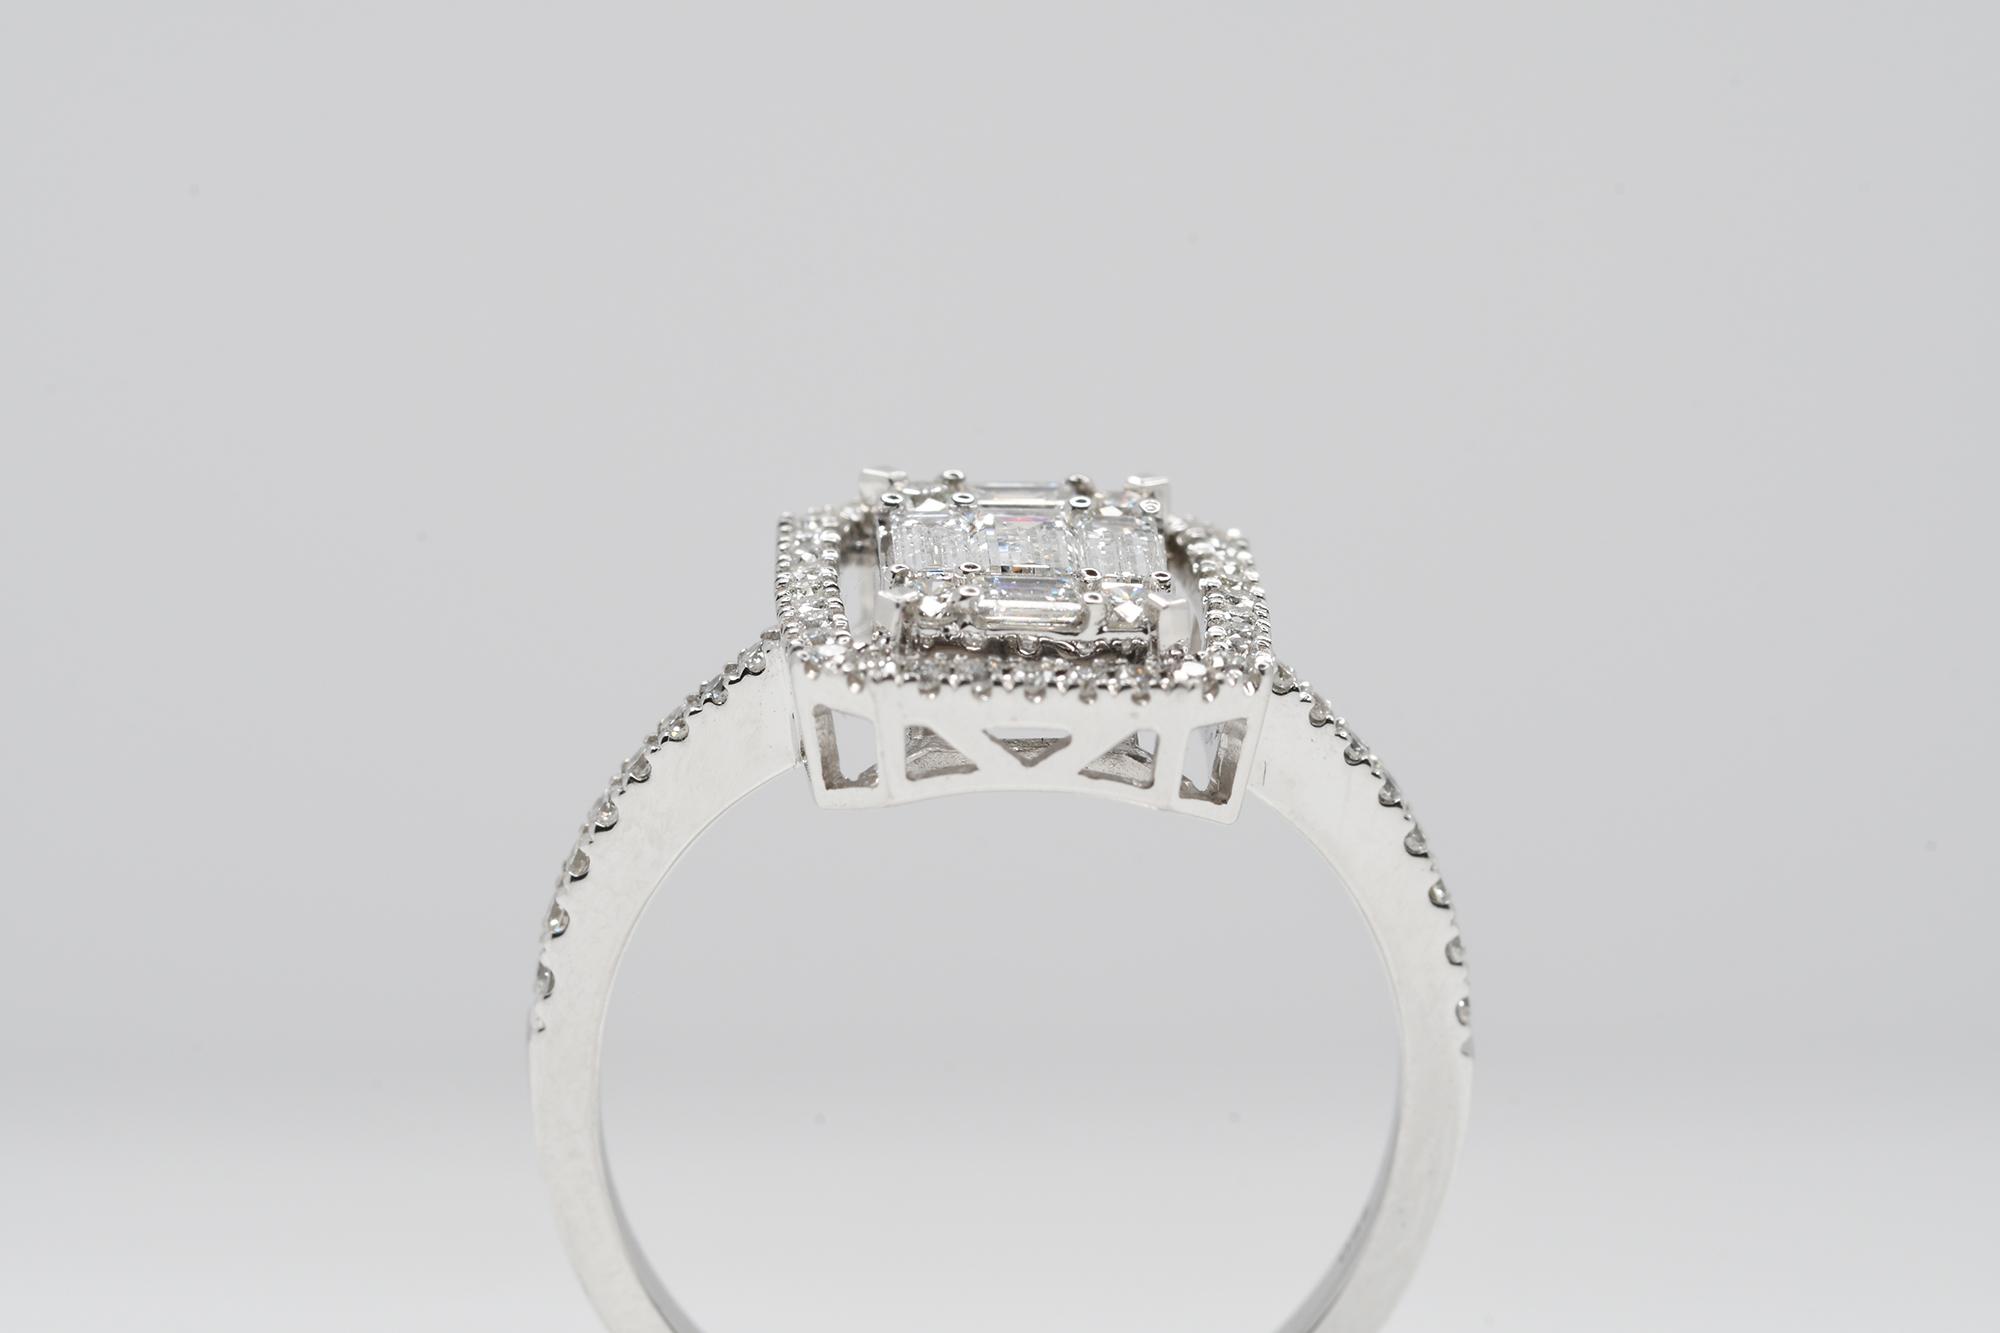 Diamond Ring - Image 2 of 3